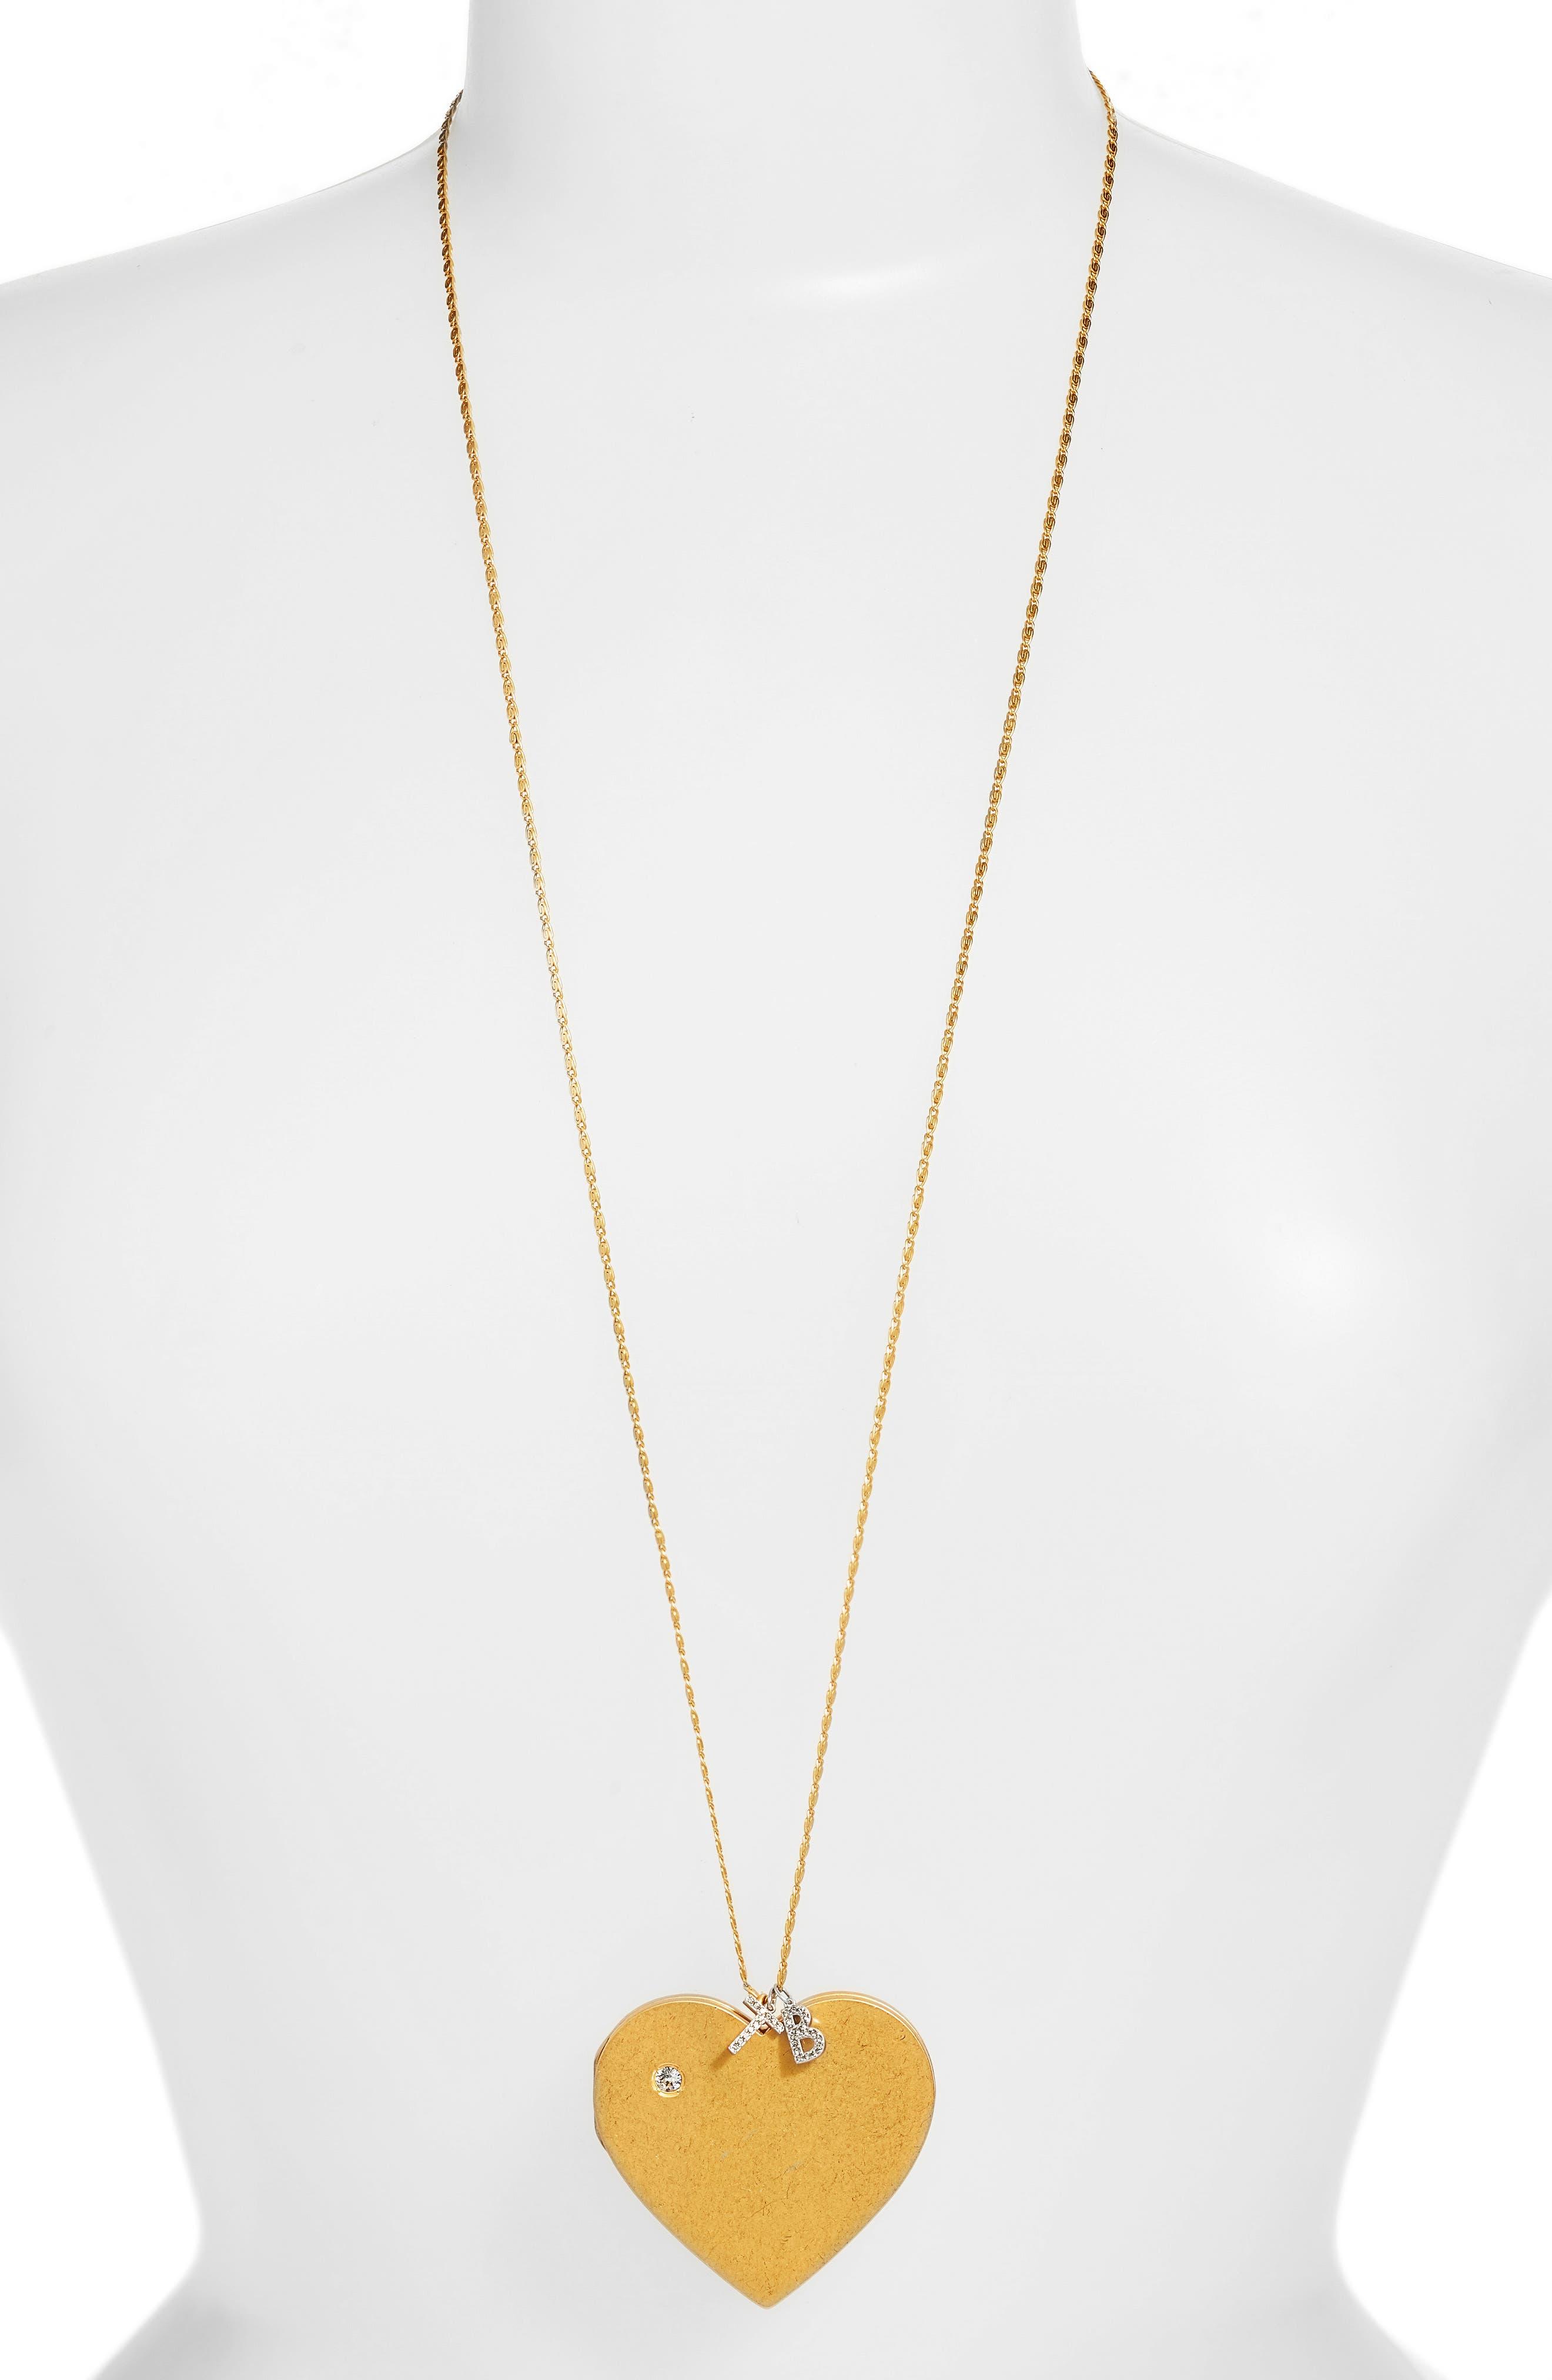 Main Image - Tory Burch Heart Locket Pendant Necklace